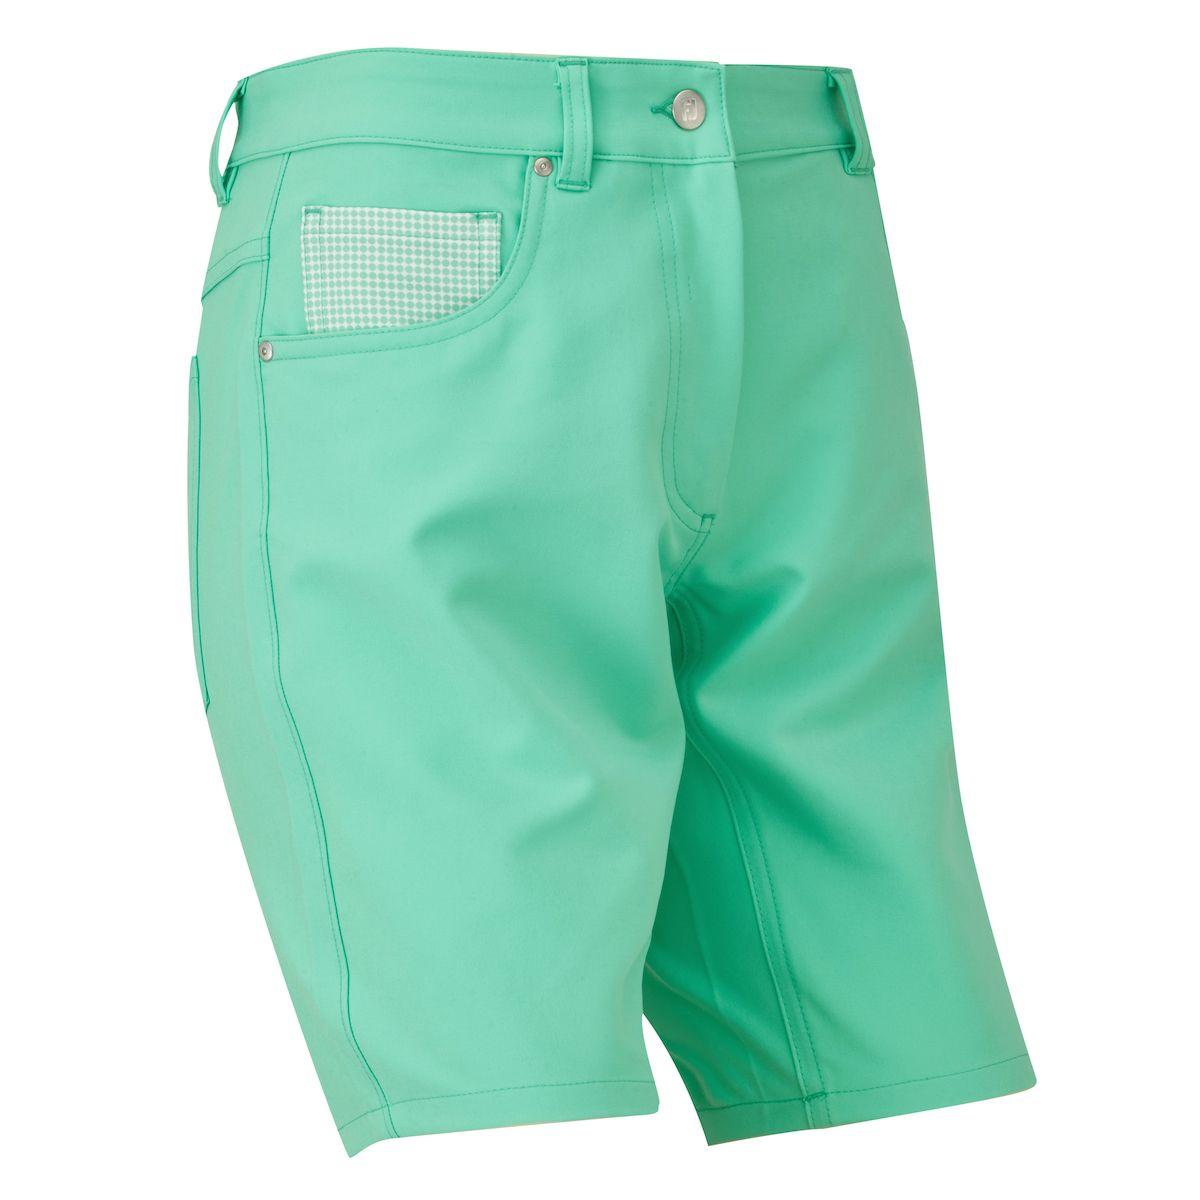 Footjoy Golfleisure Stretch Short Damen grün